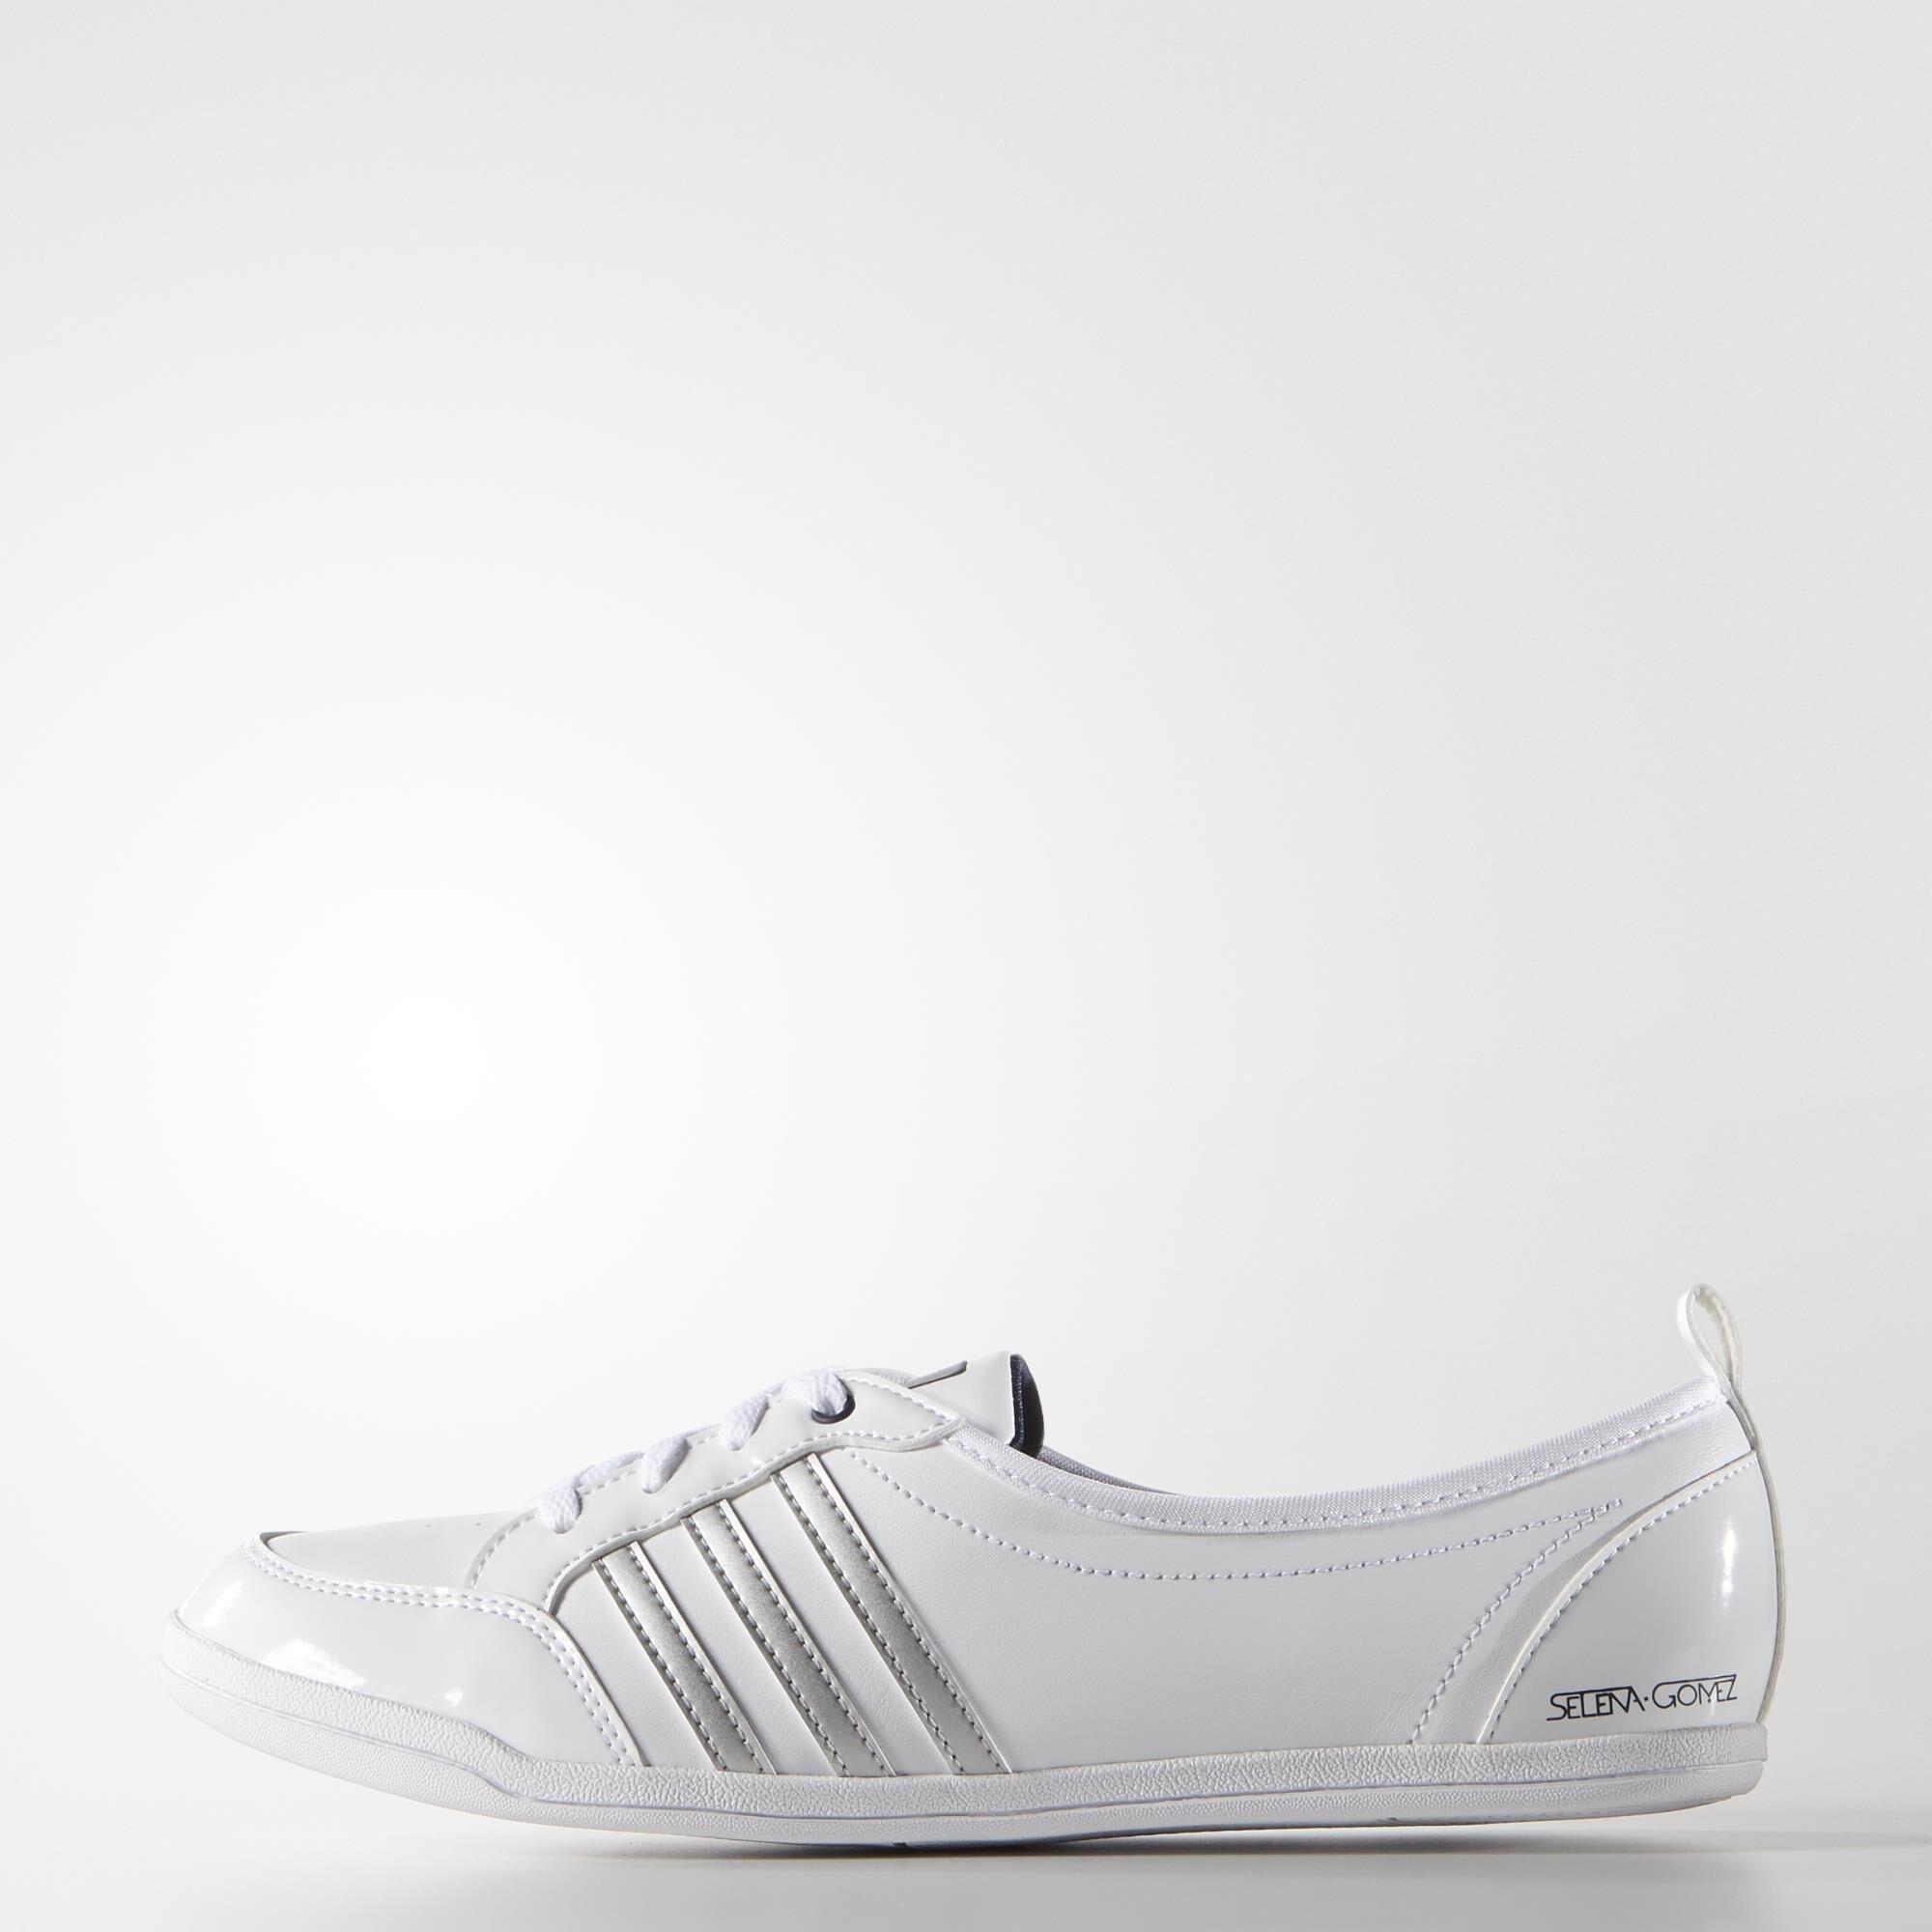 adidas neo selena gomez shoes. Black Bedroom Furniture Sets. Home Design Ideas